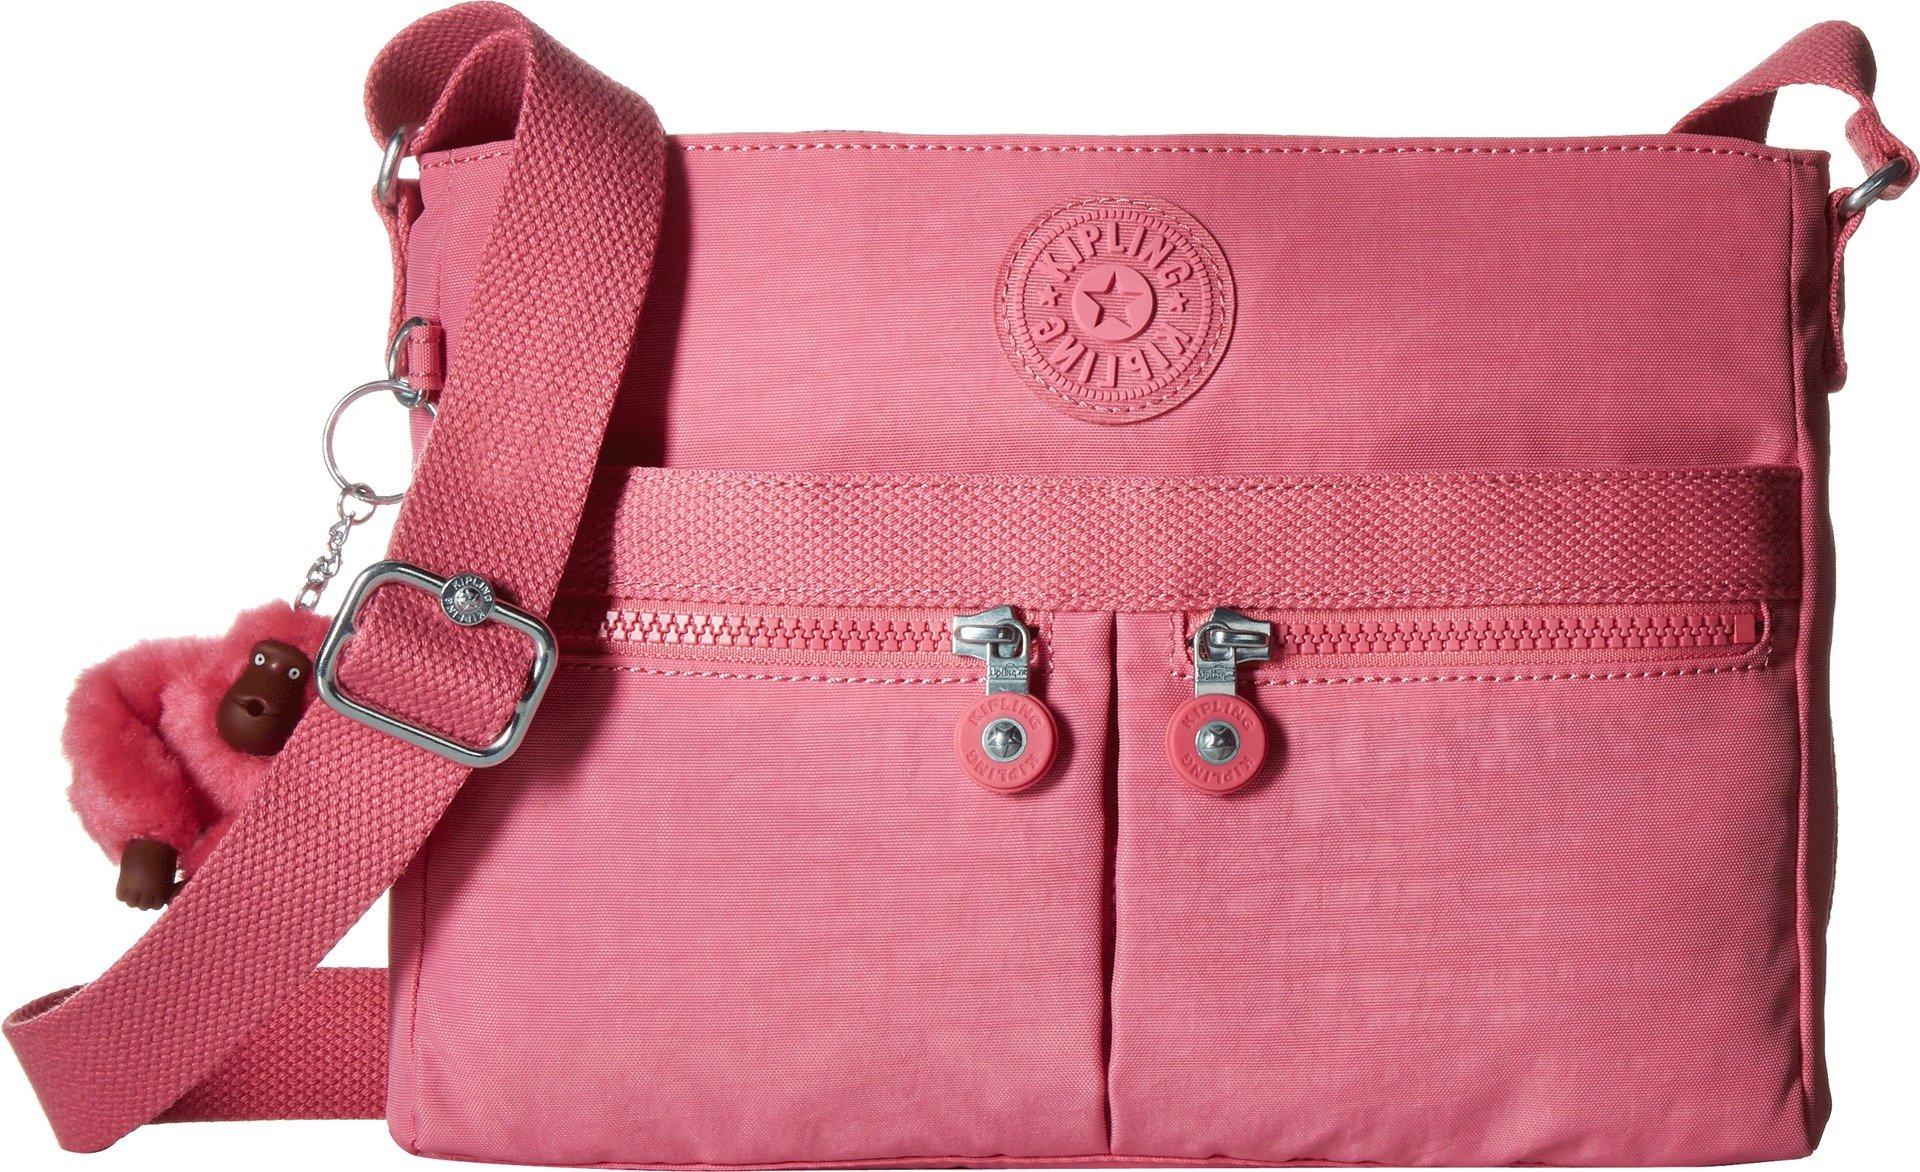 Kipling Angie Pink Macarons Convertible Crossbody Bag, Pnkmacaron